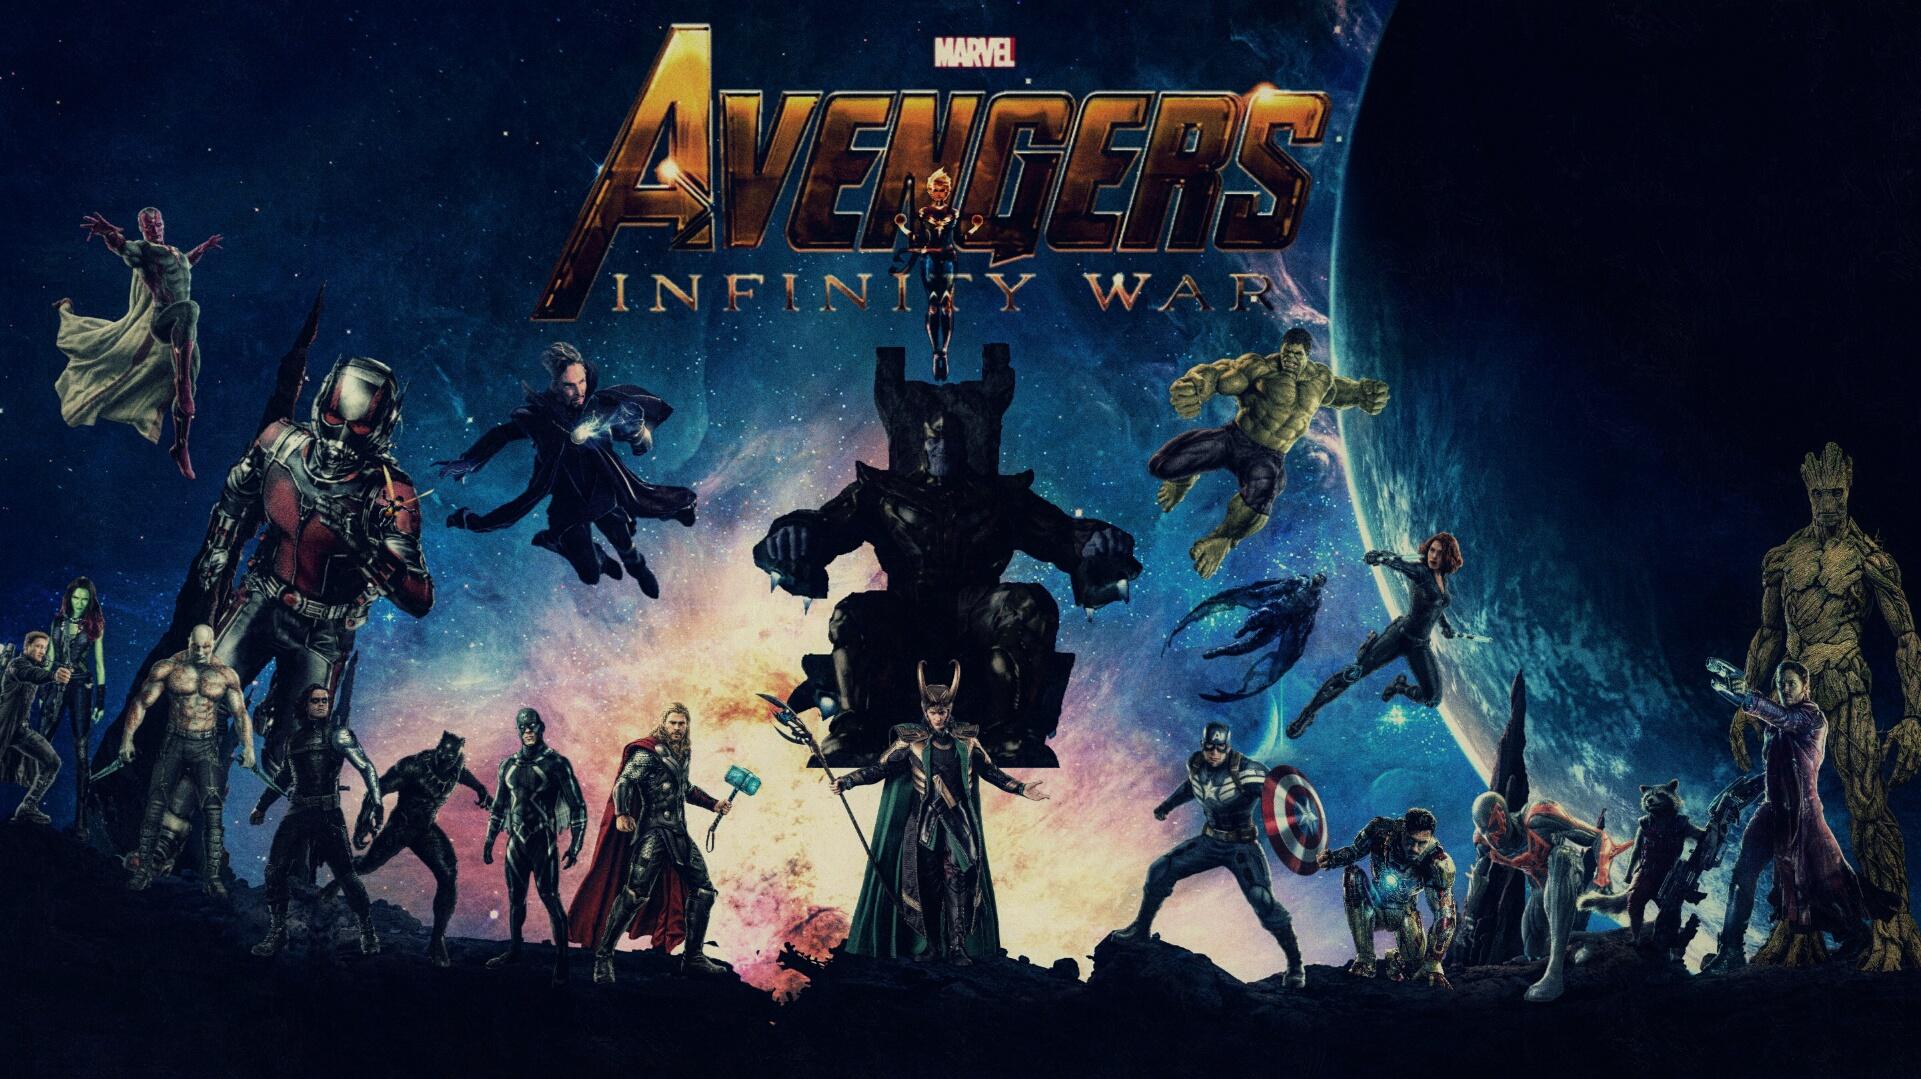 Avengers Infinity War Wallpapers - My Free Wallpapers Hub